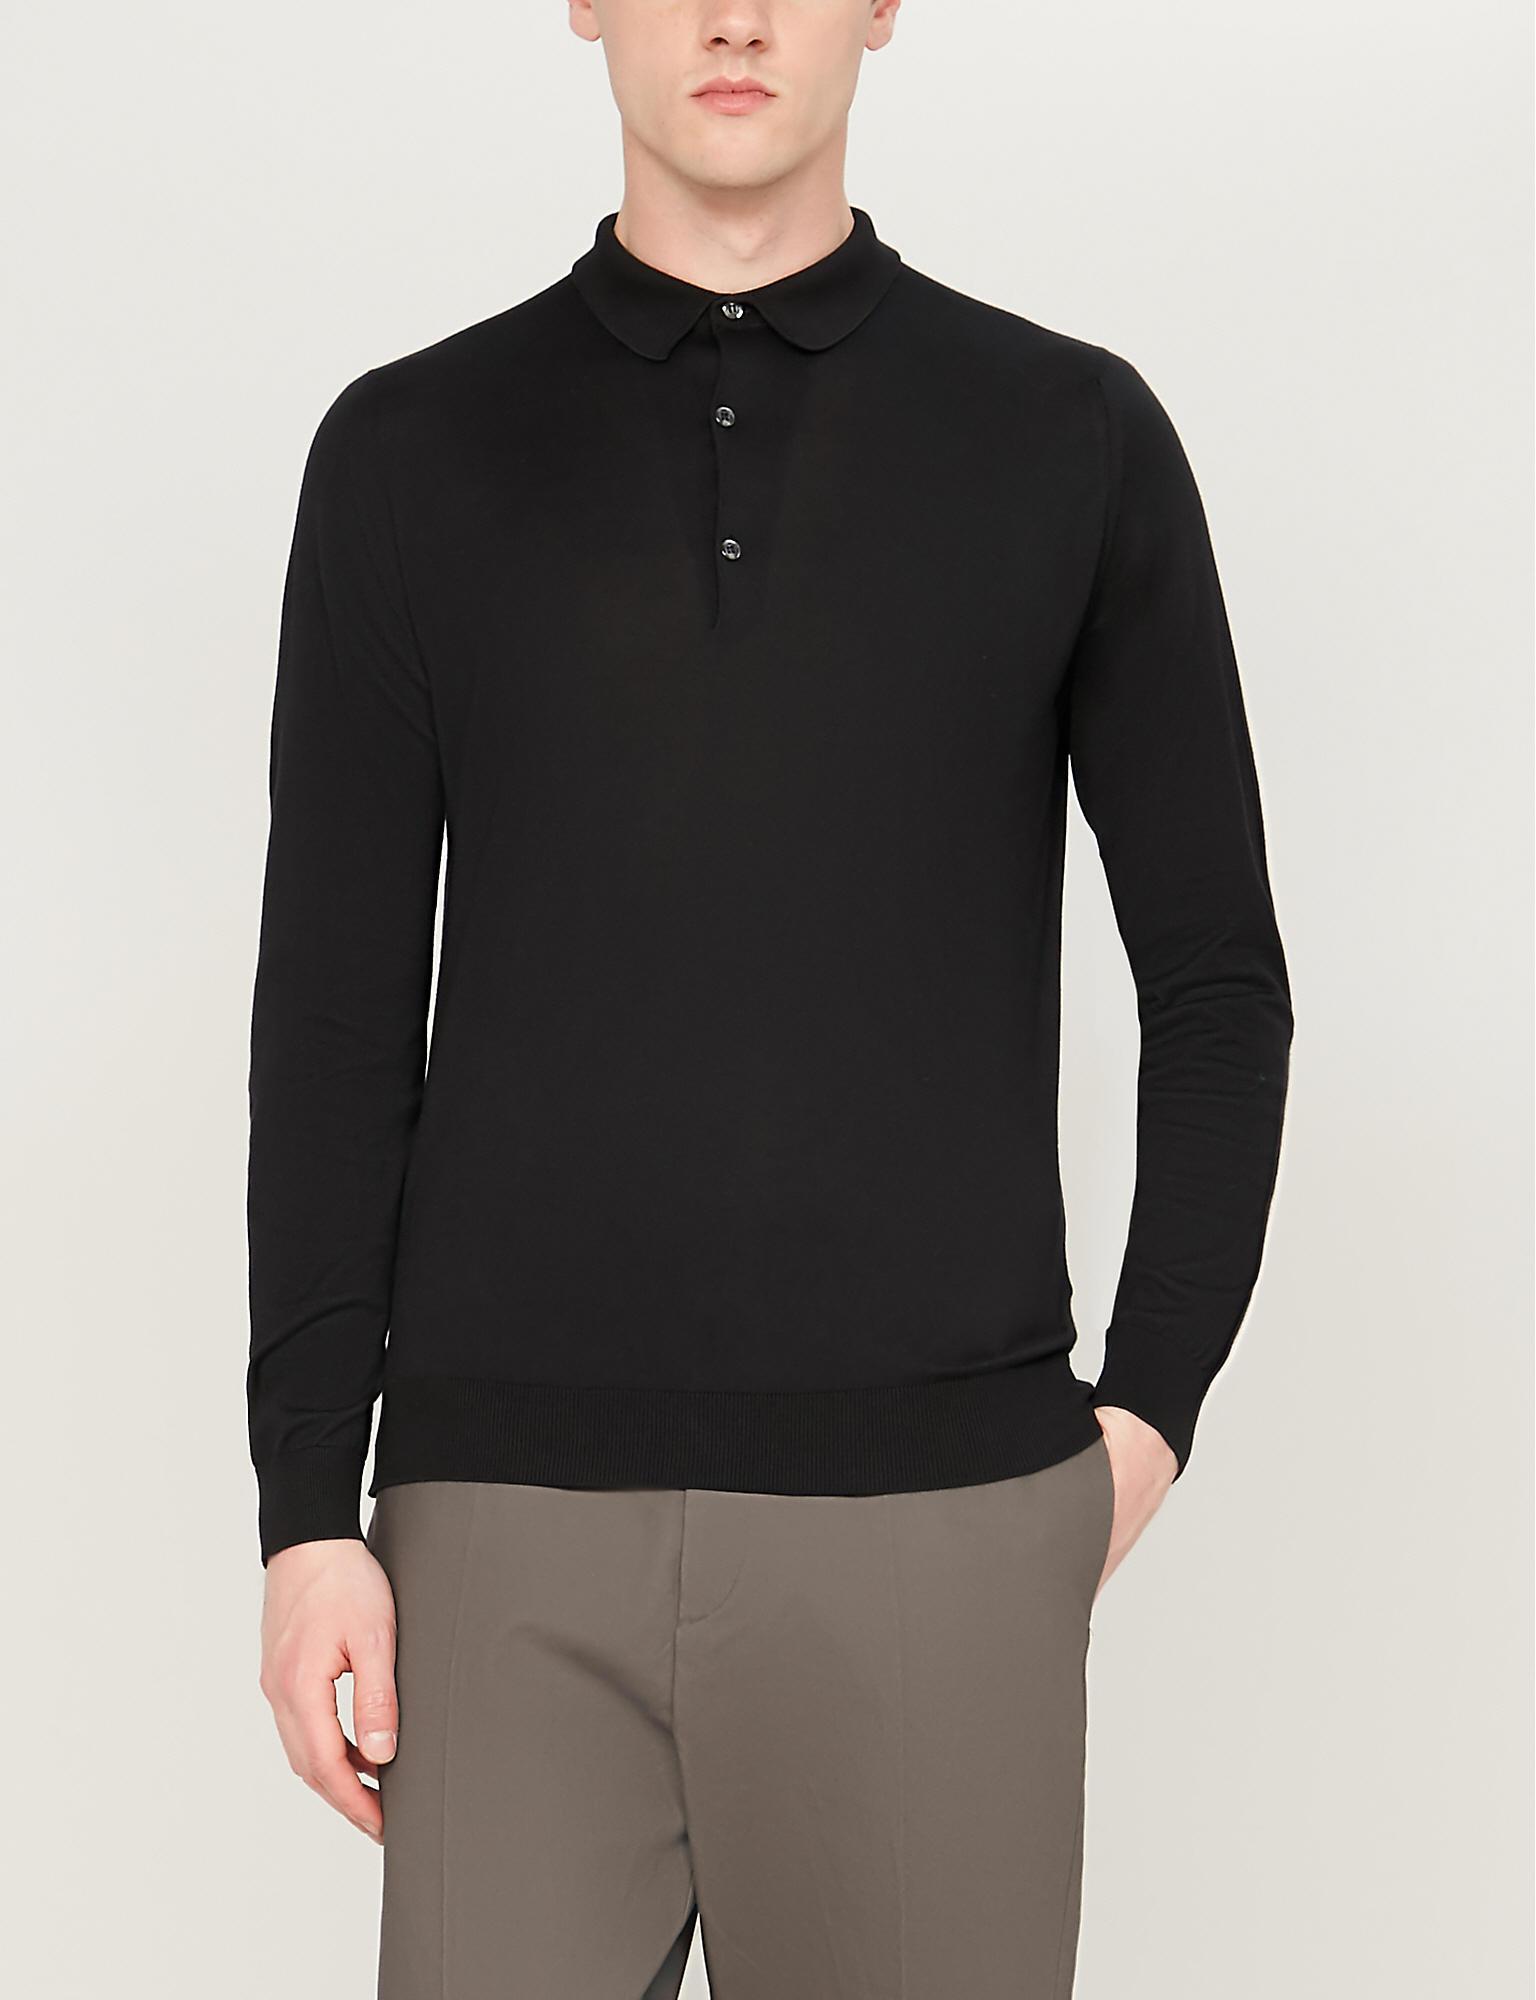 2e8d5f6b John Smedley Bradwell Knitted Polo Jumper in Black for Men - Lyst